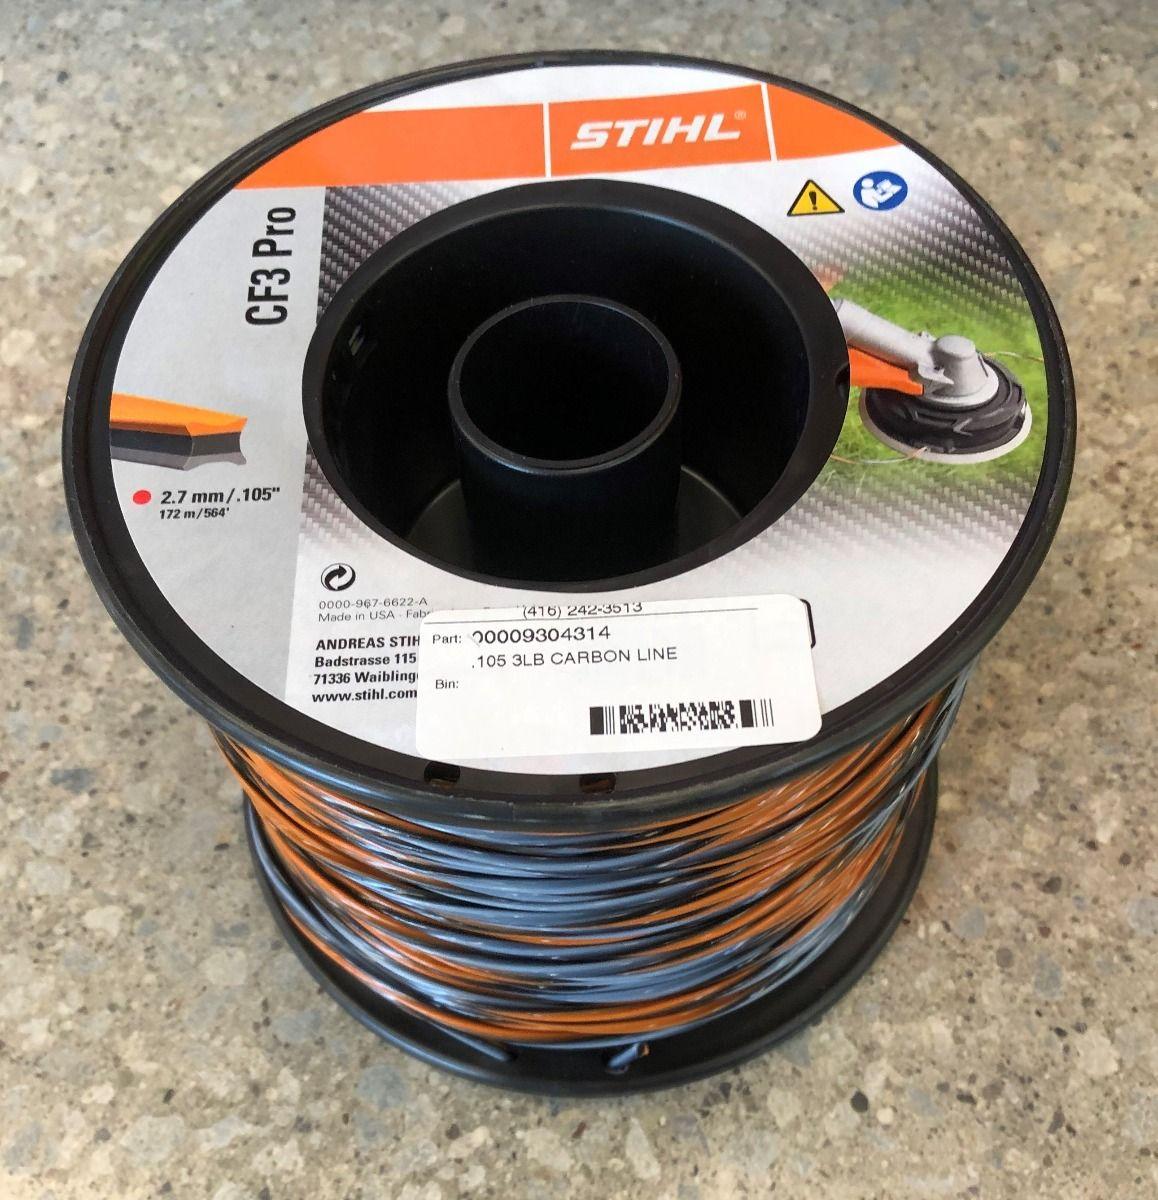 Stihl .105 Carbon Trimmer Line 3lb Roll